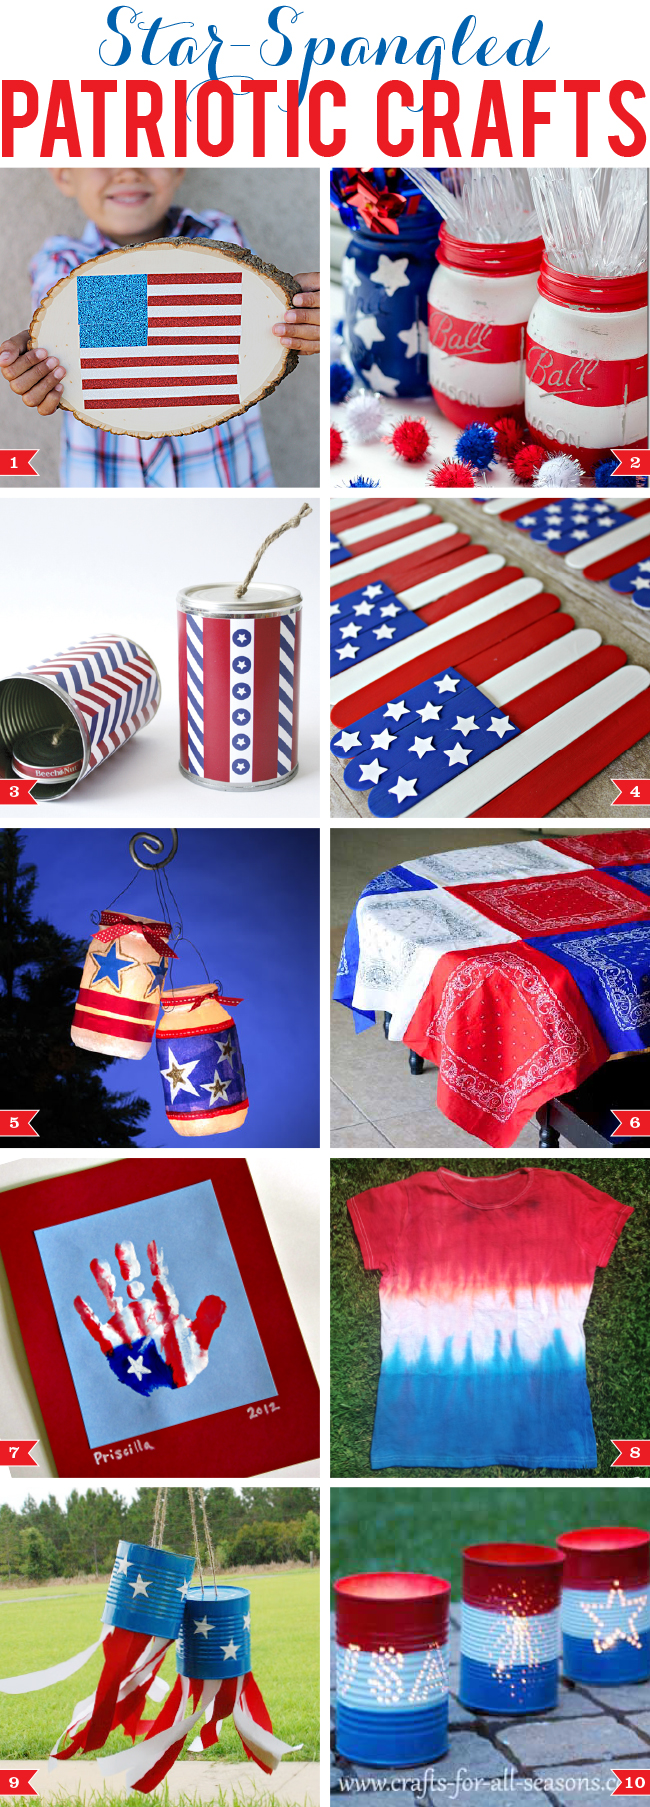 Star-spangled patriotic crafts